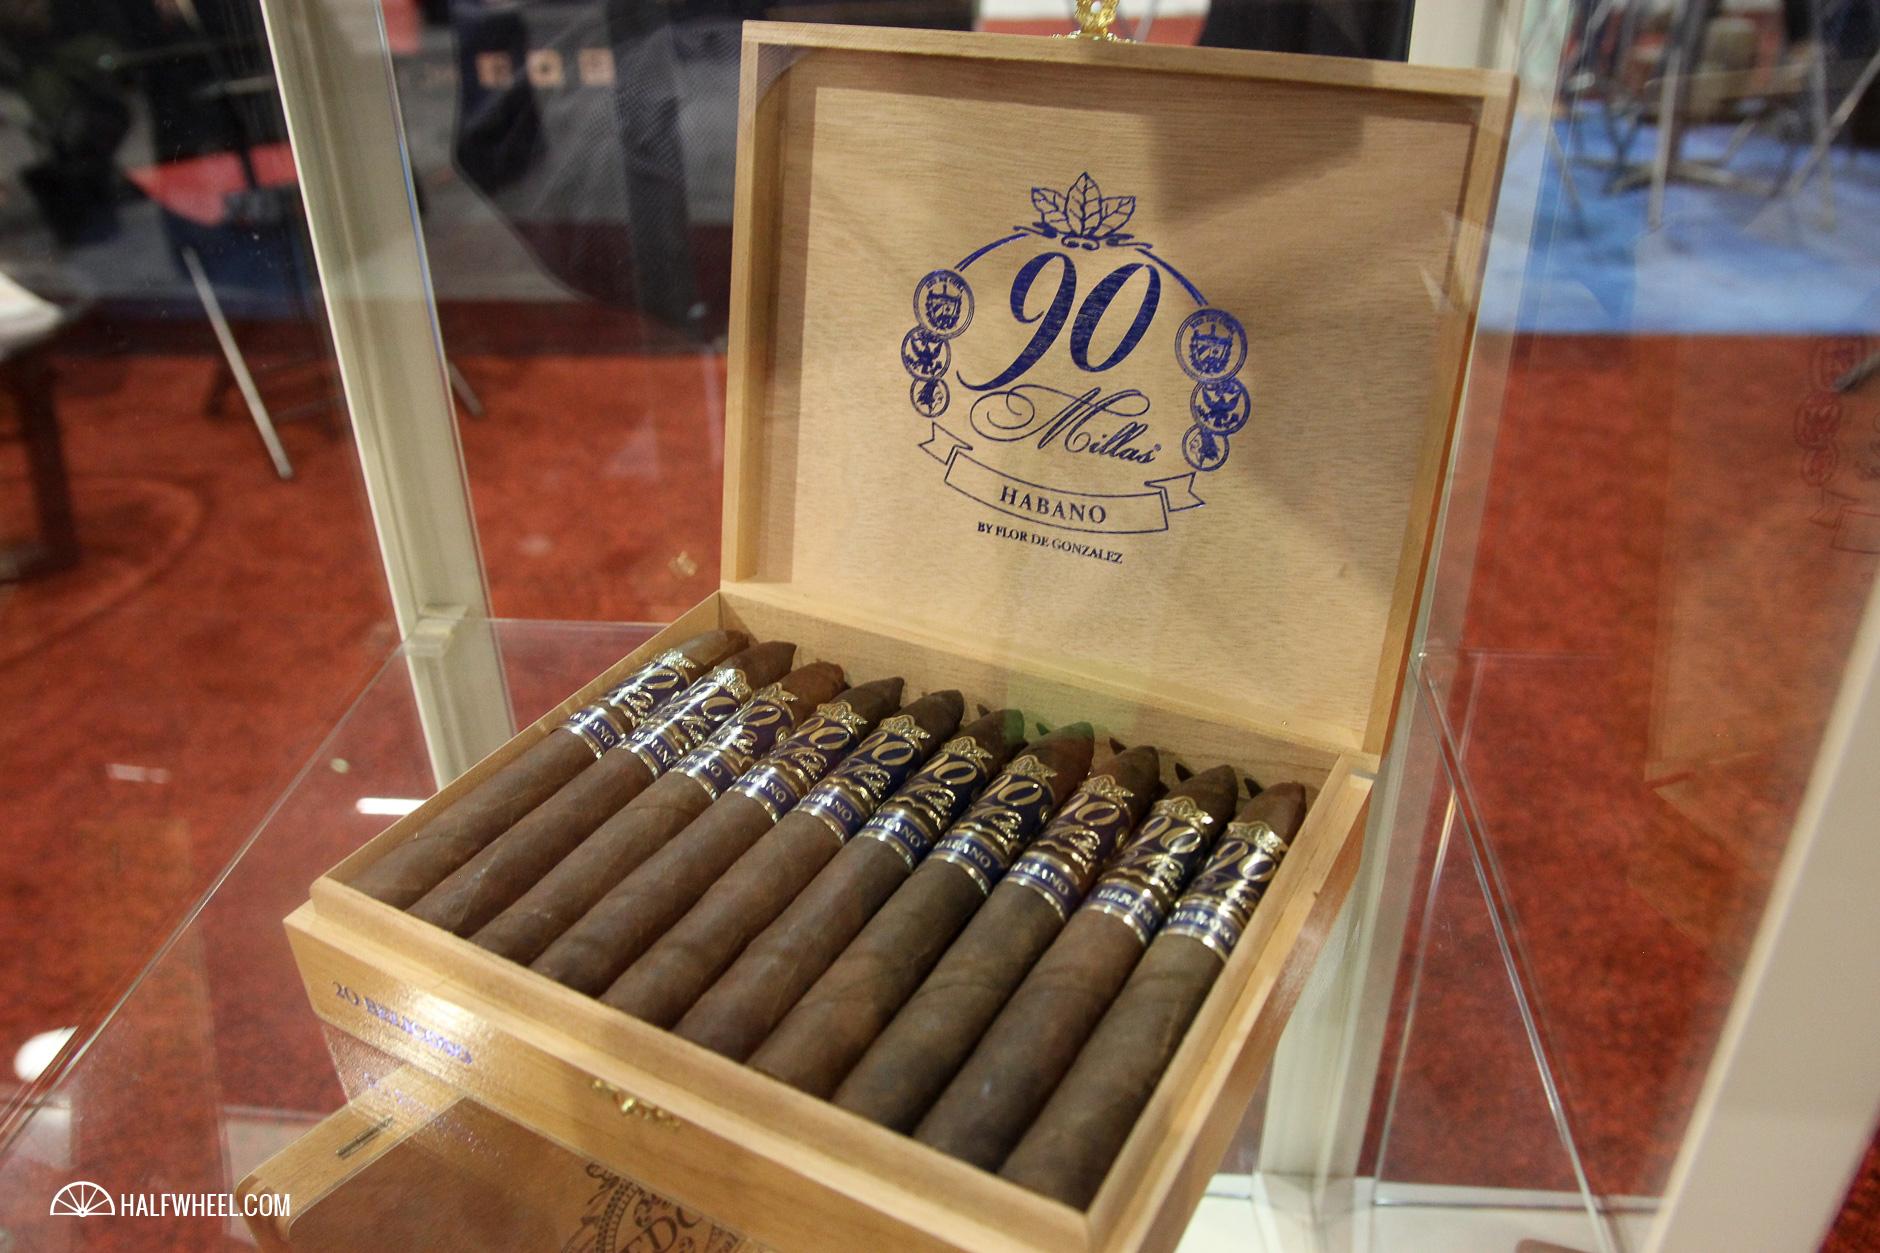 FDG Cigars 90 Millas Habano IPCPR 2016